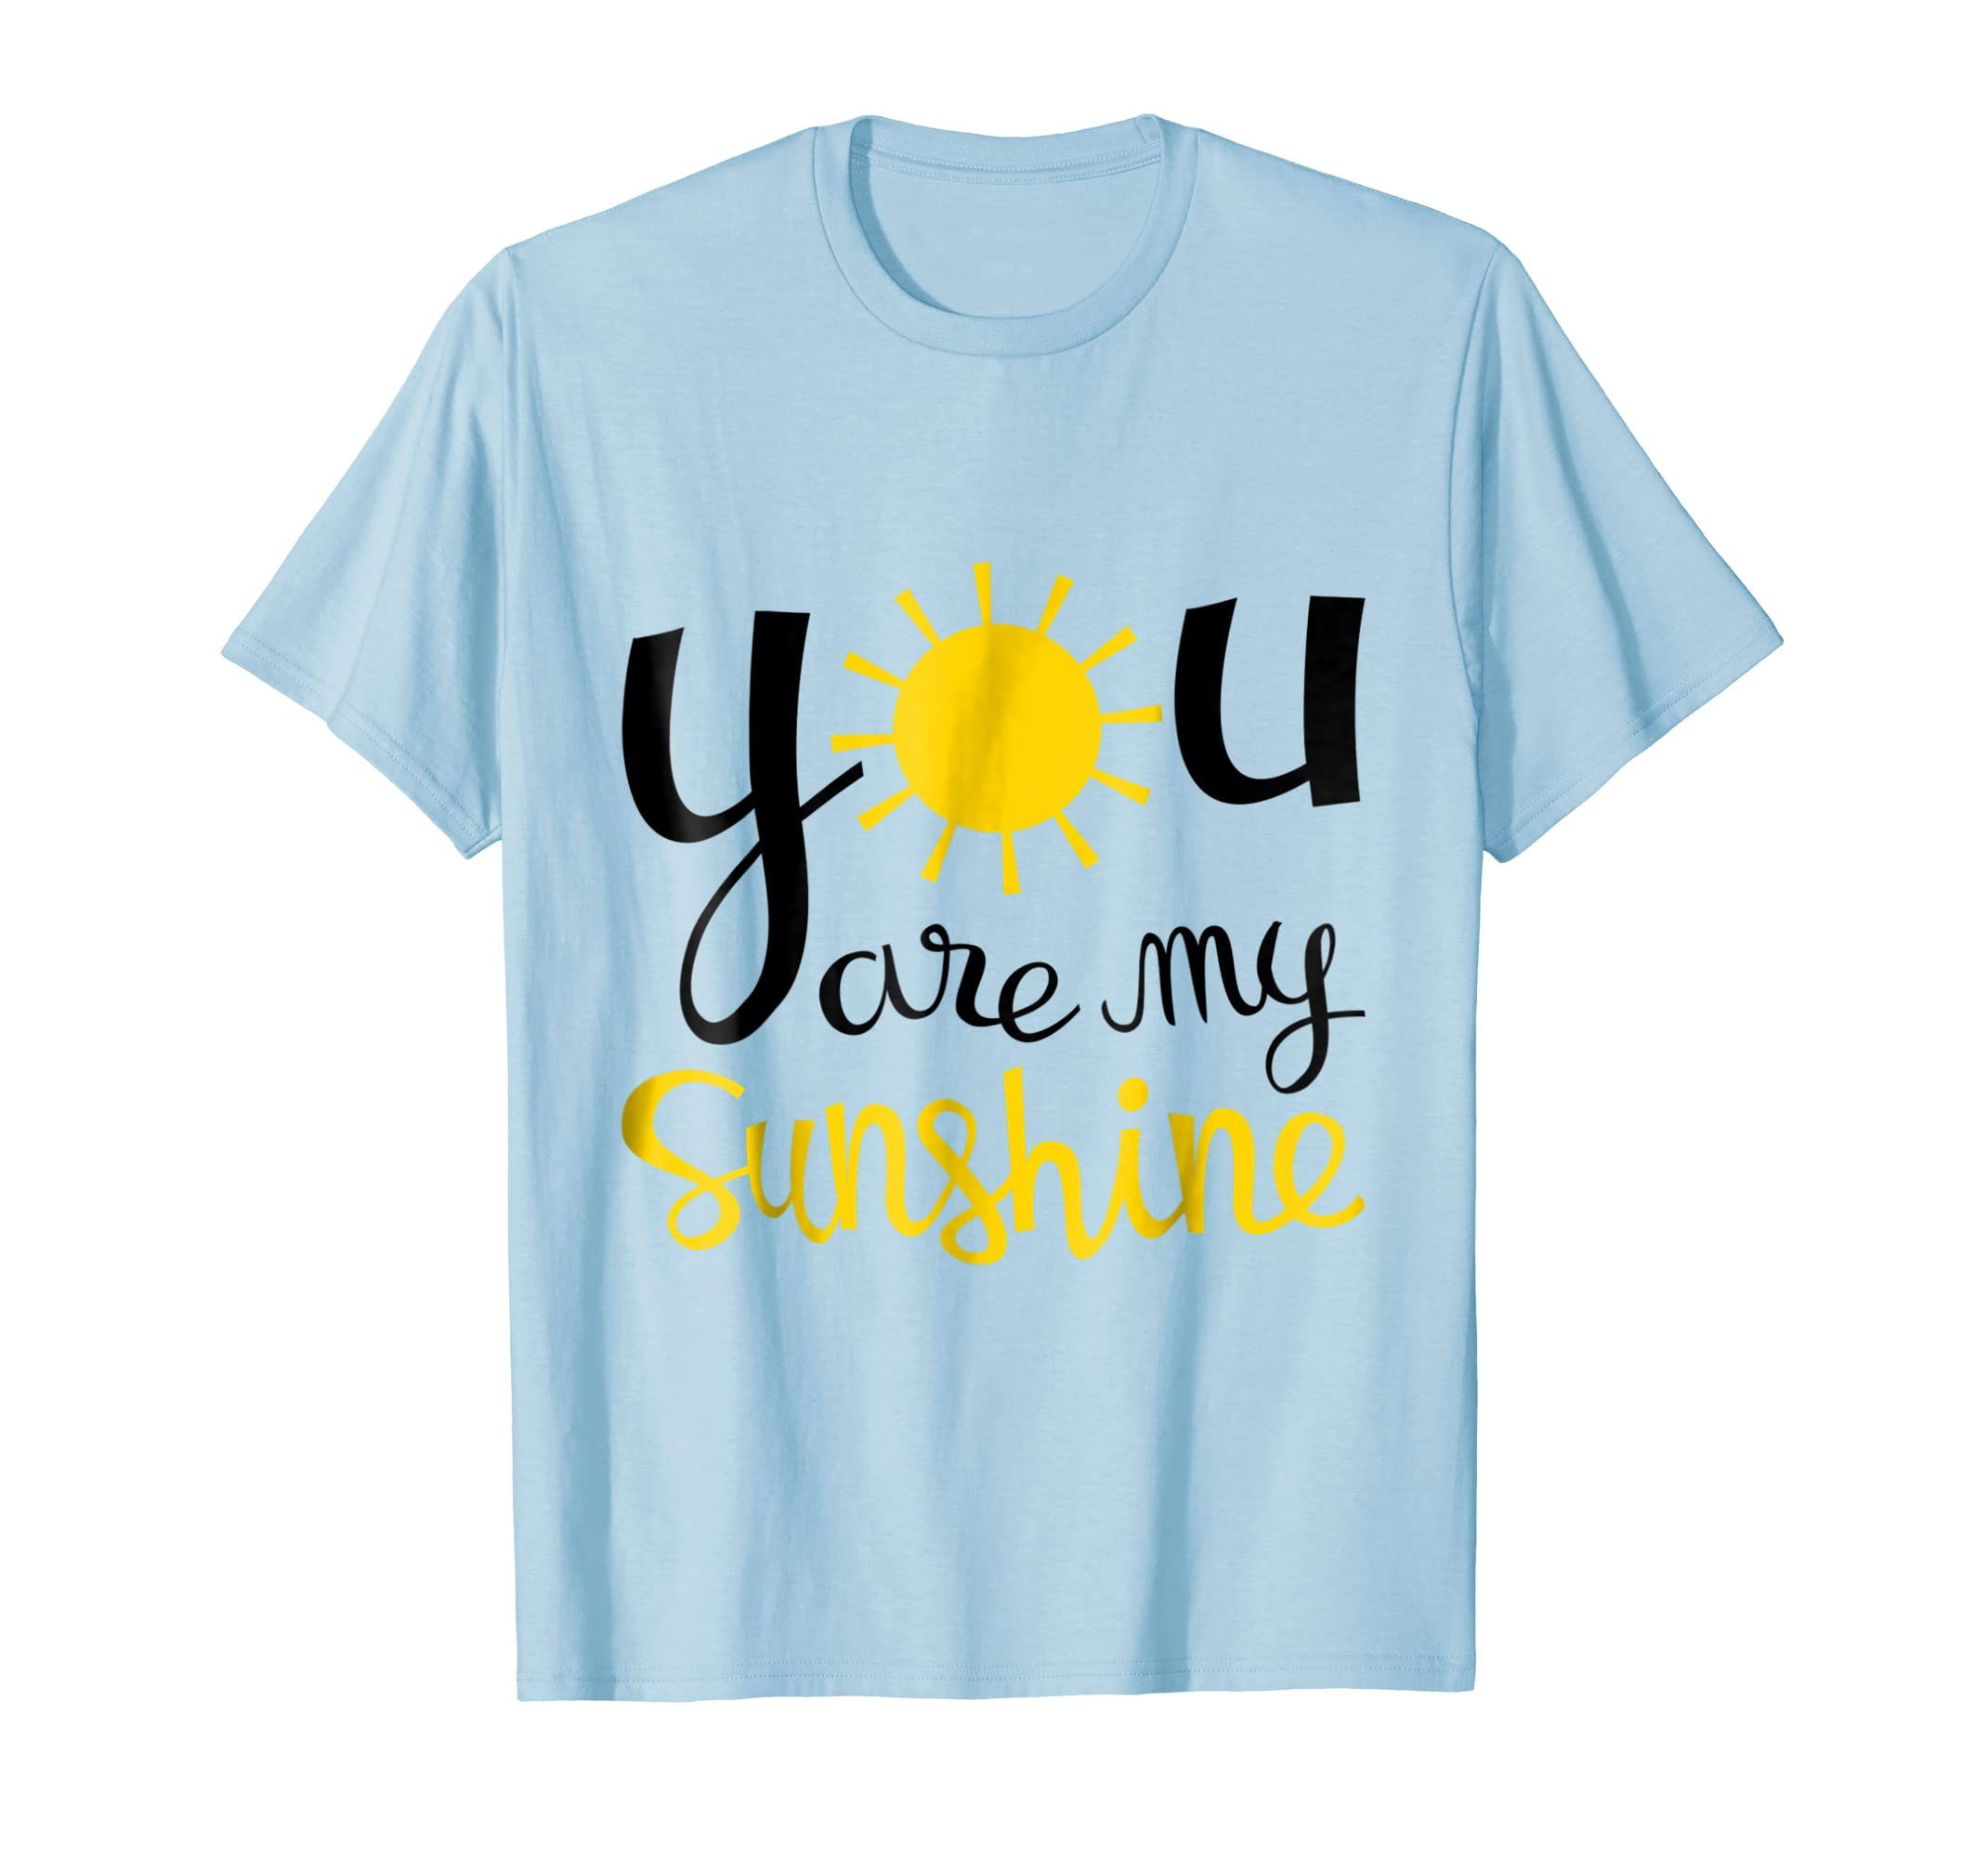 a561de2ea89f You Are My Sunshine T Shirt for Boys, Girls, Women and Men-Teechatpro –  Teechatpro.com